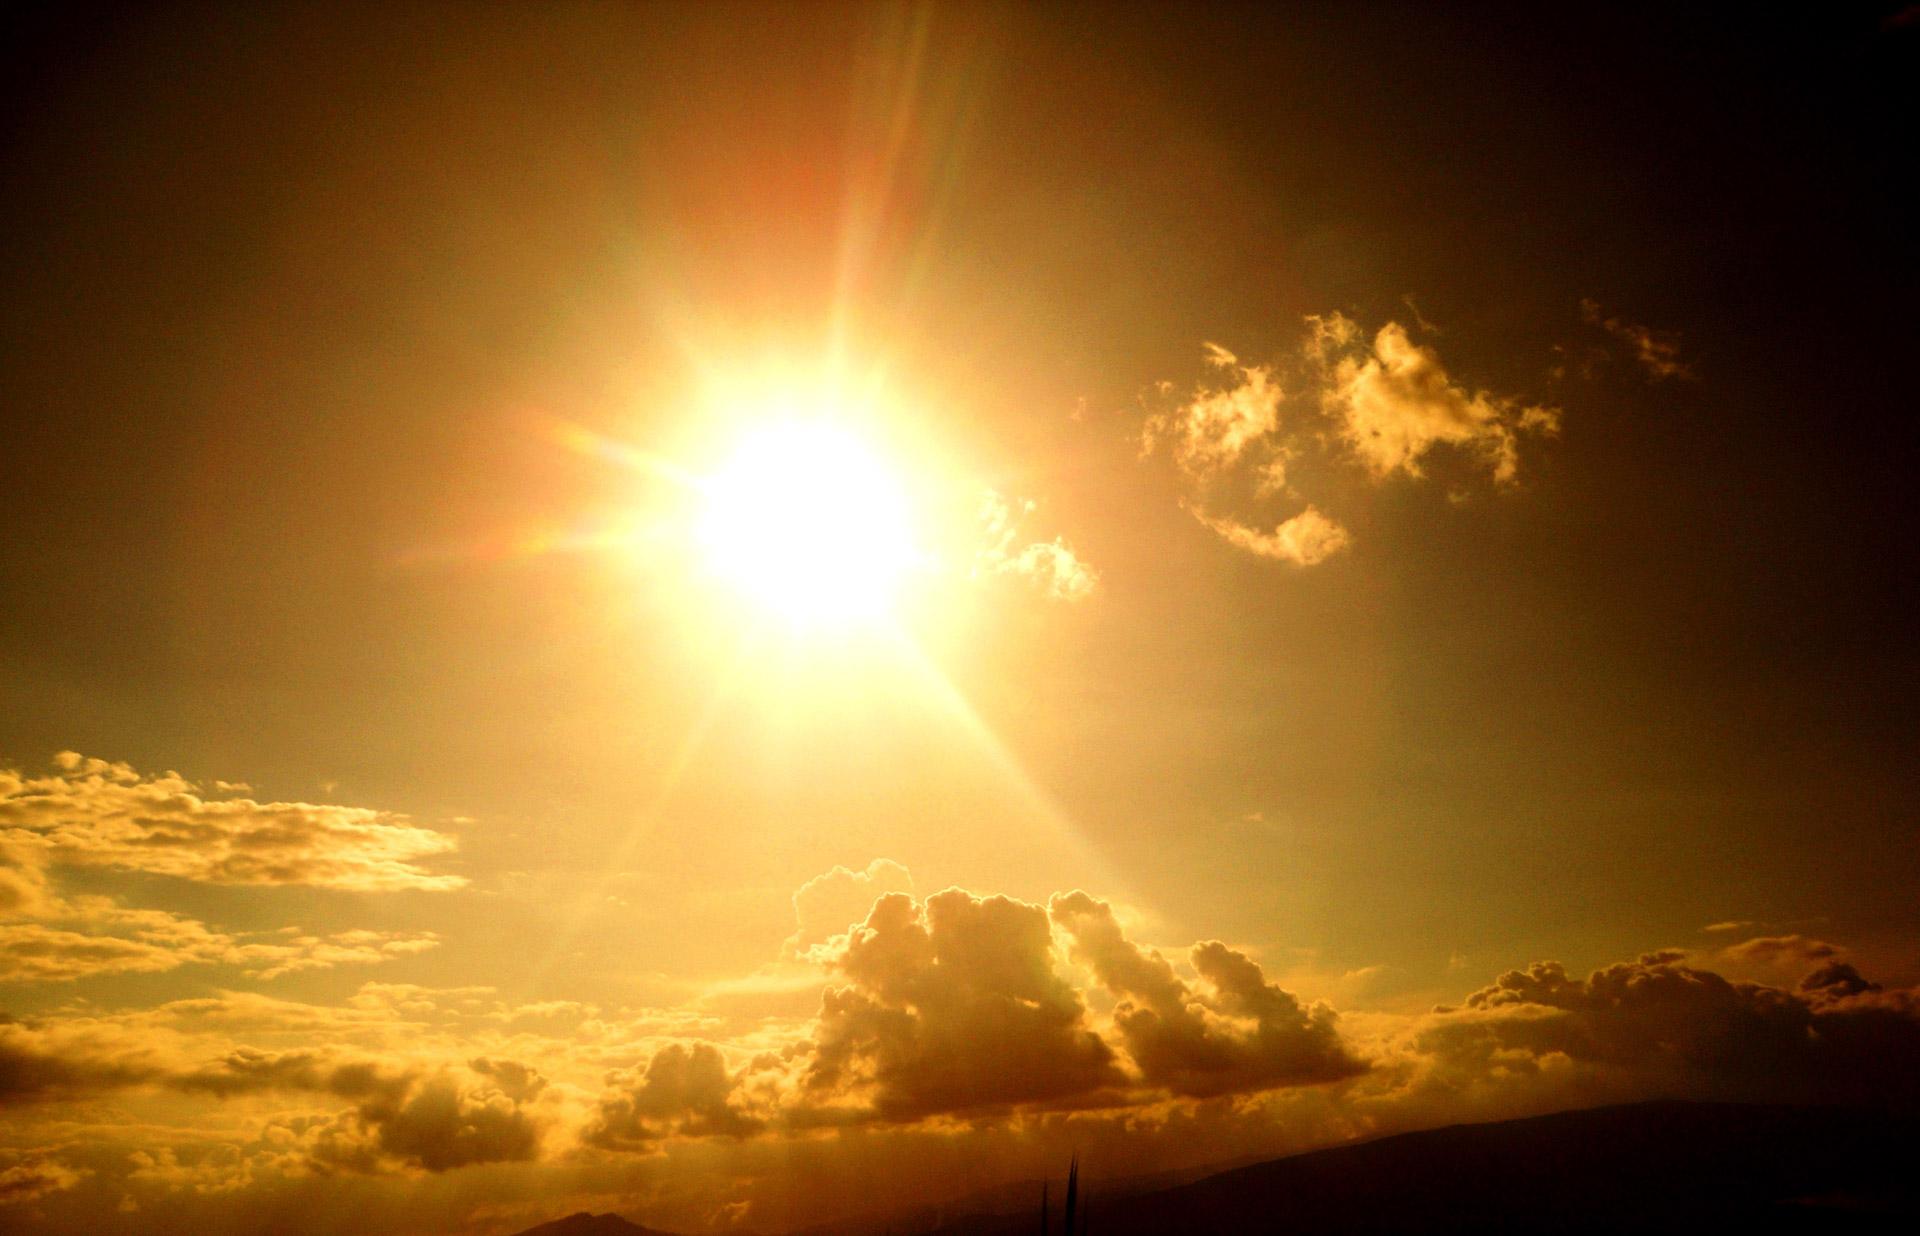 Sunlight Image